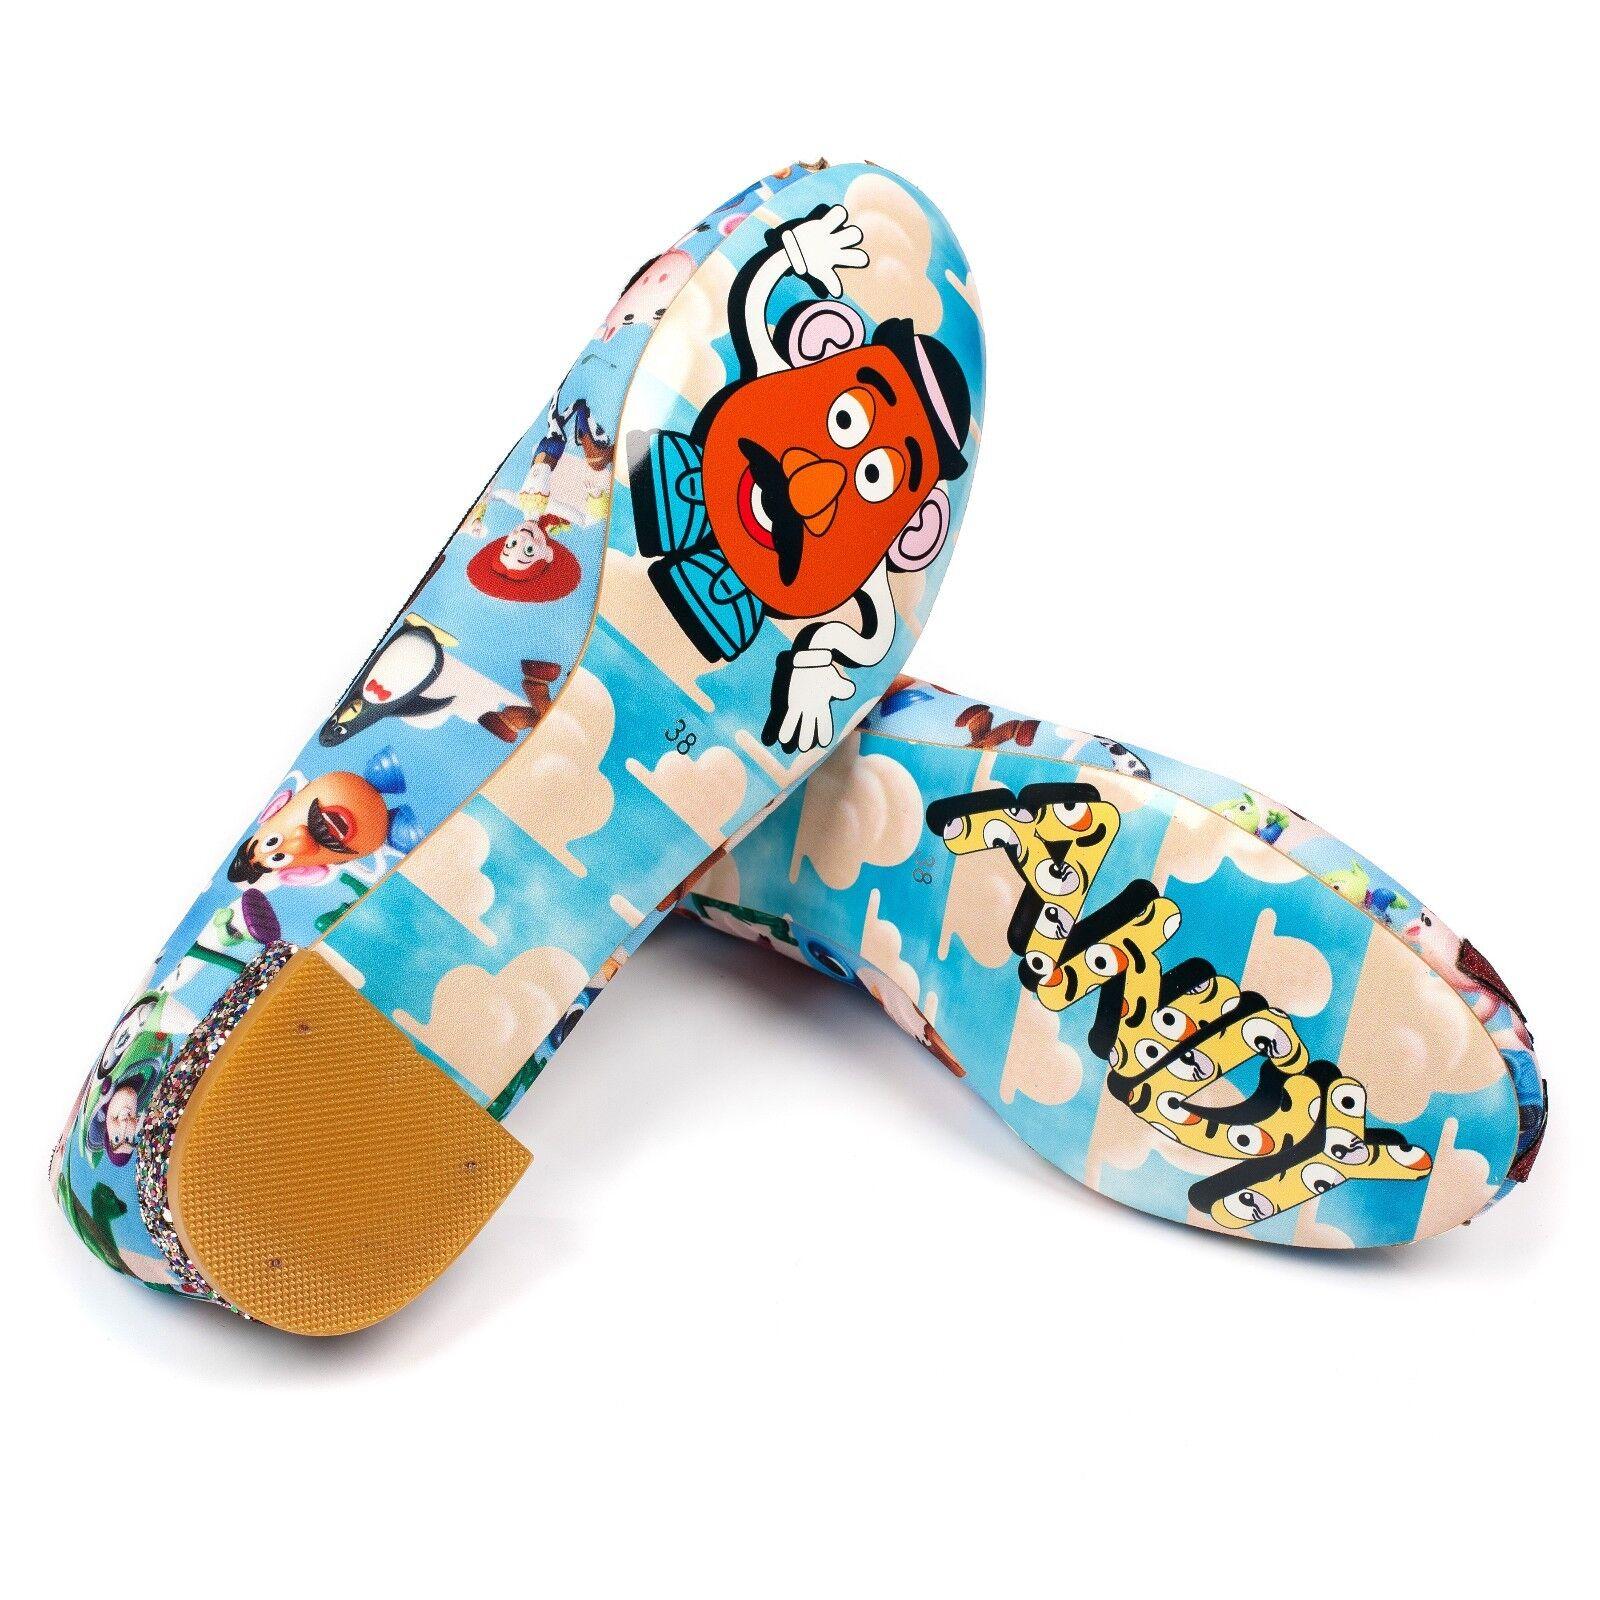 Irregular Toy Choice Keep Em Together Disney Toy Irregular Story Mr&Ms Potato Head Schuhe 5.5-10 2acaf5